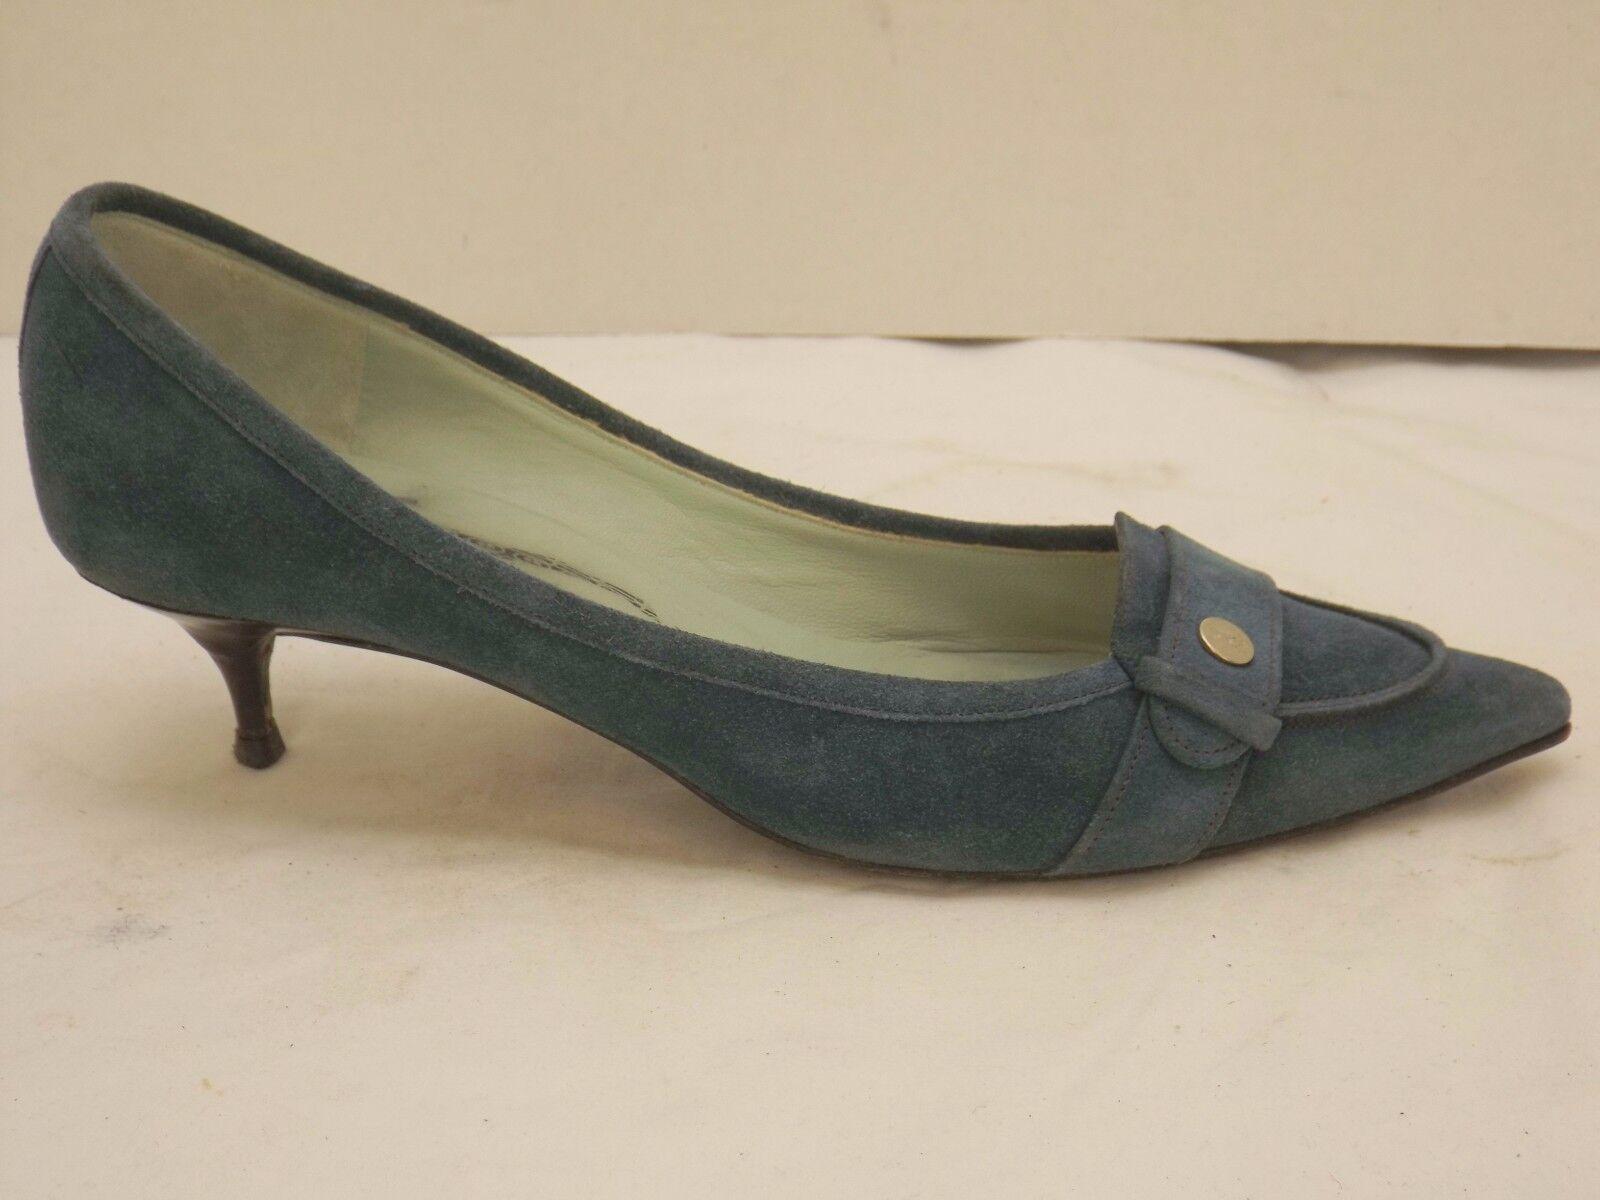 risparmia fino al 70% di sconto 6.5 B blu-verde Belle by by by Sigerson Morrison pointy toe kitten heels pumps scarpe  nuovo di marca